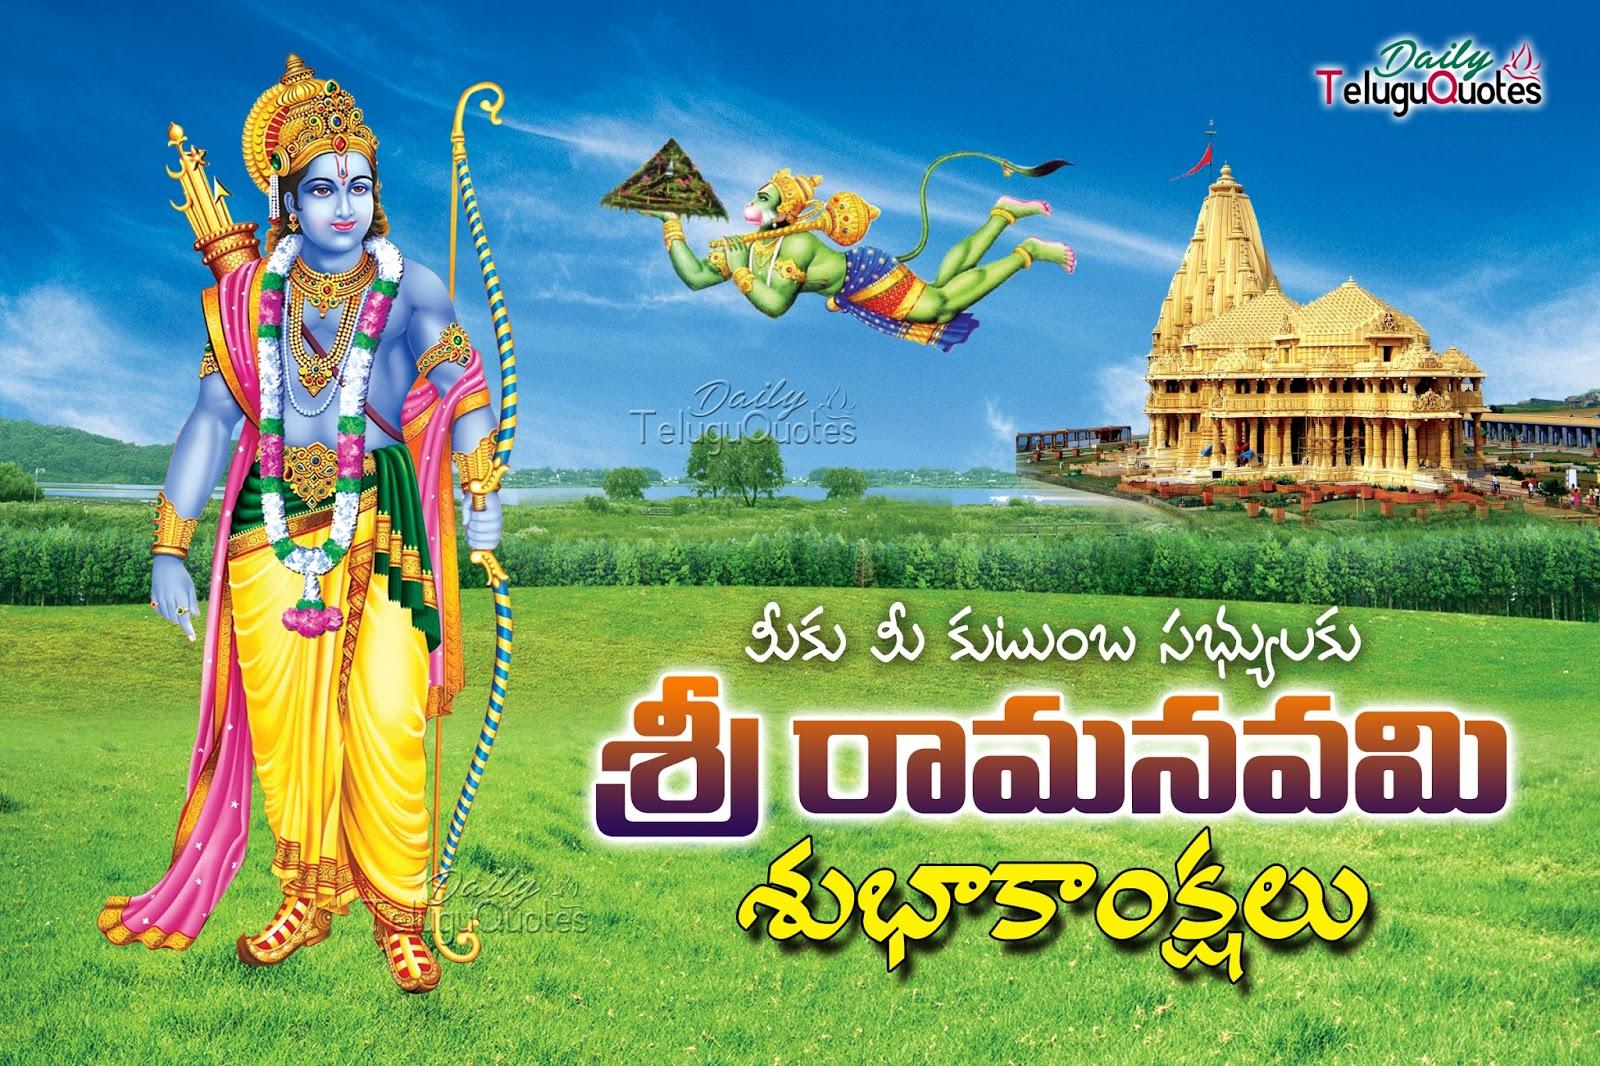 Srirama navami telugu greetings slokas quotes sms happy sri rama navami hd wishes greetings with lord hanuman hd image m4hsunfo